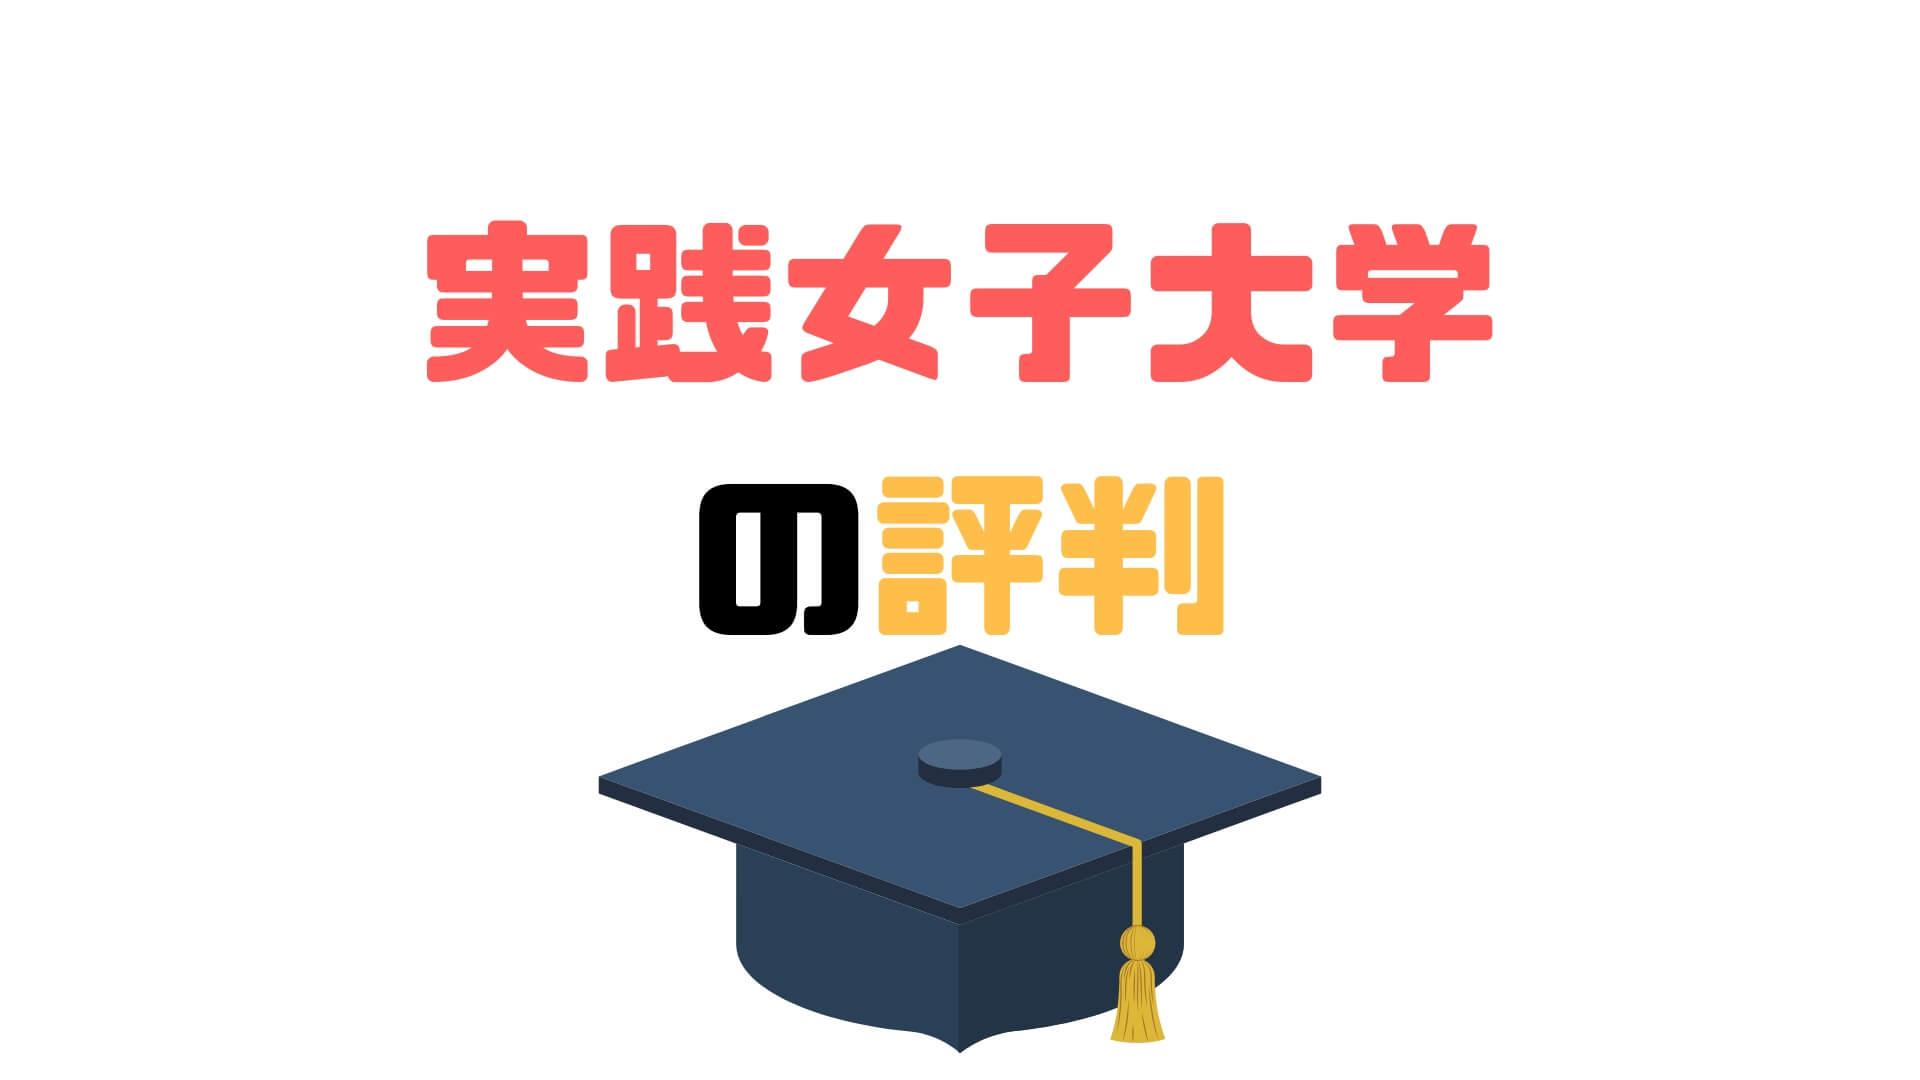 実践女子大学の評判